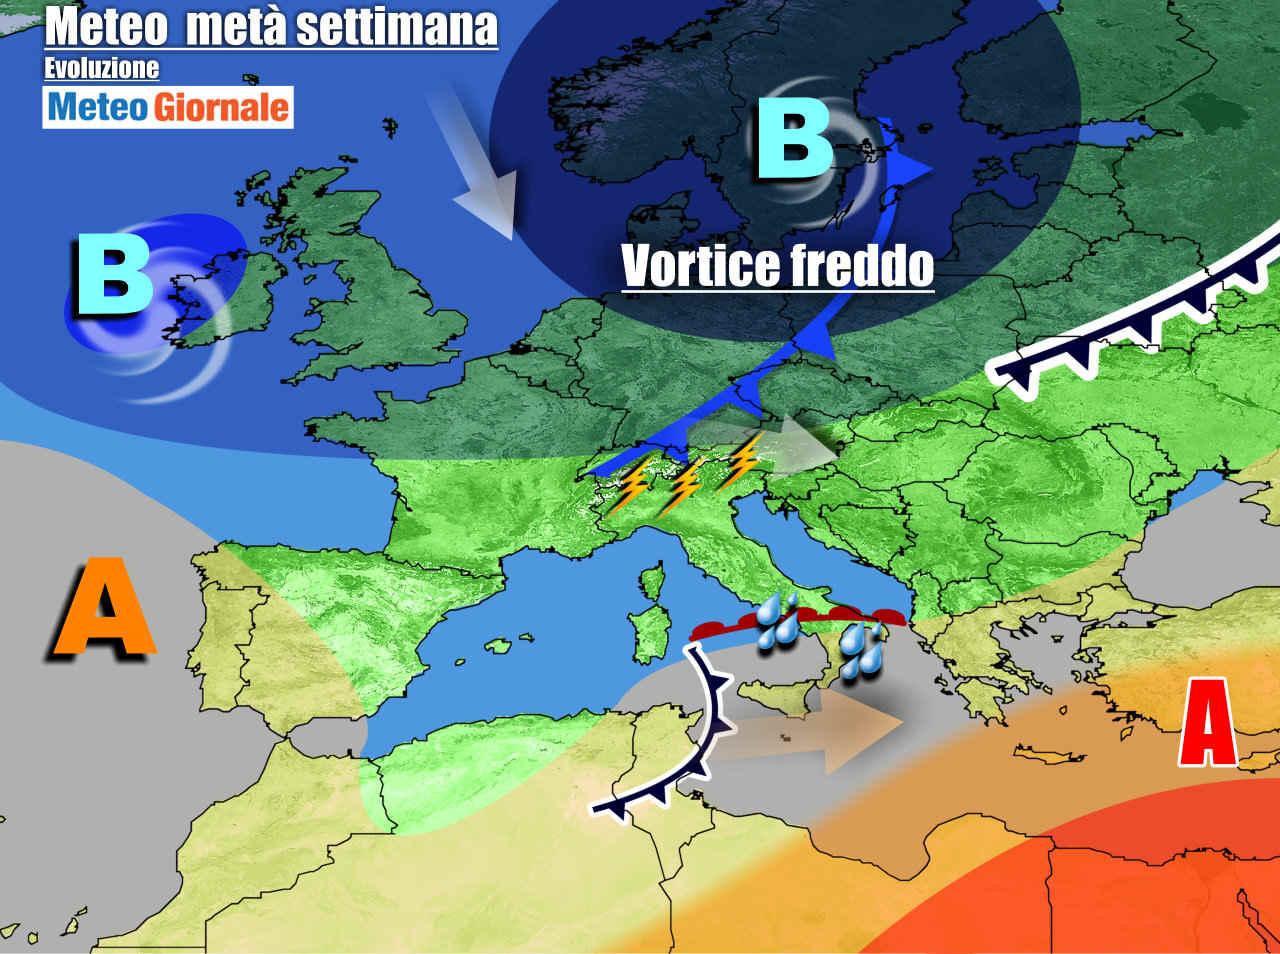 meteo-italia-previsioni